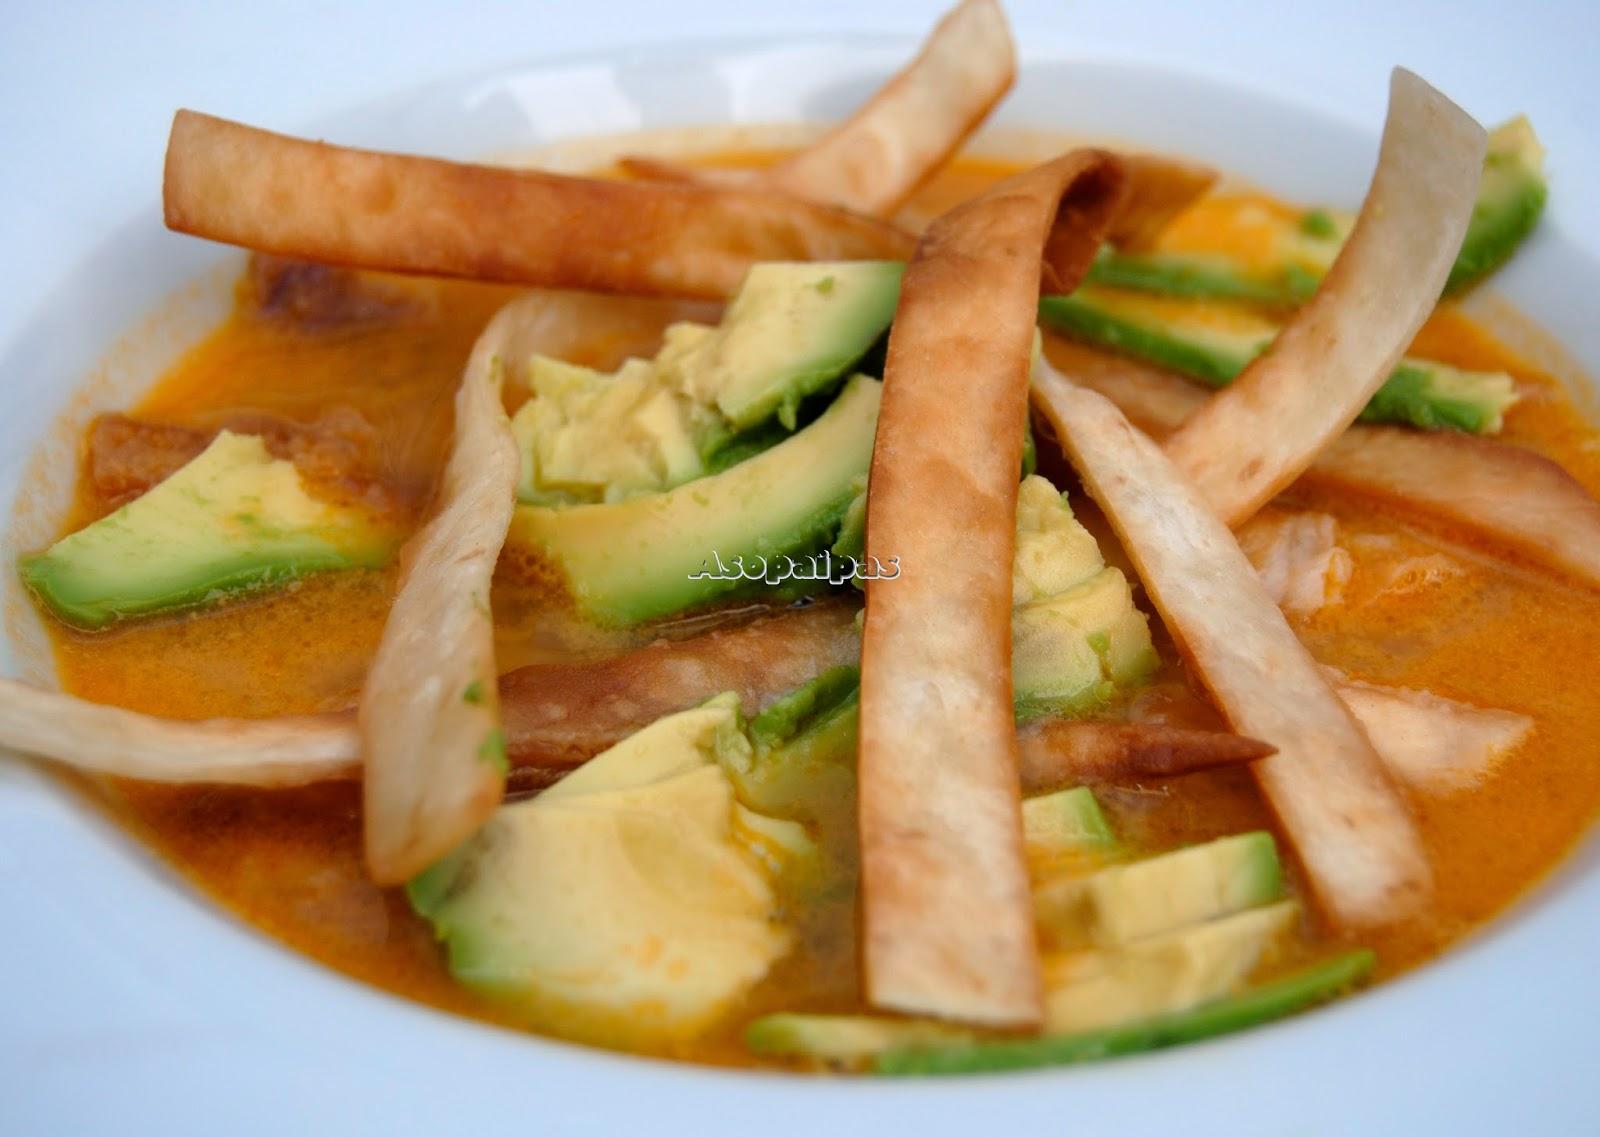 Sopa Azteca Receta  Asopaipas Recetas de Cocina Casera